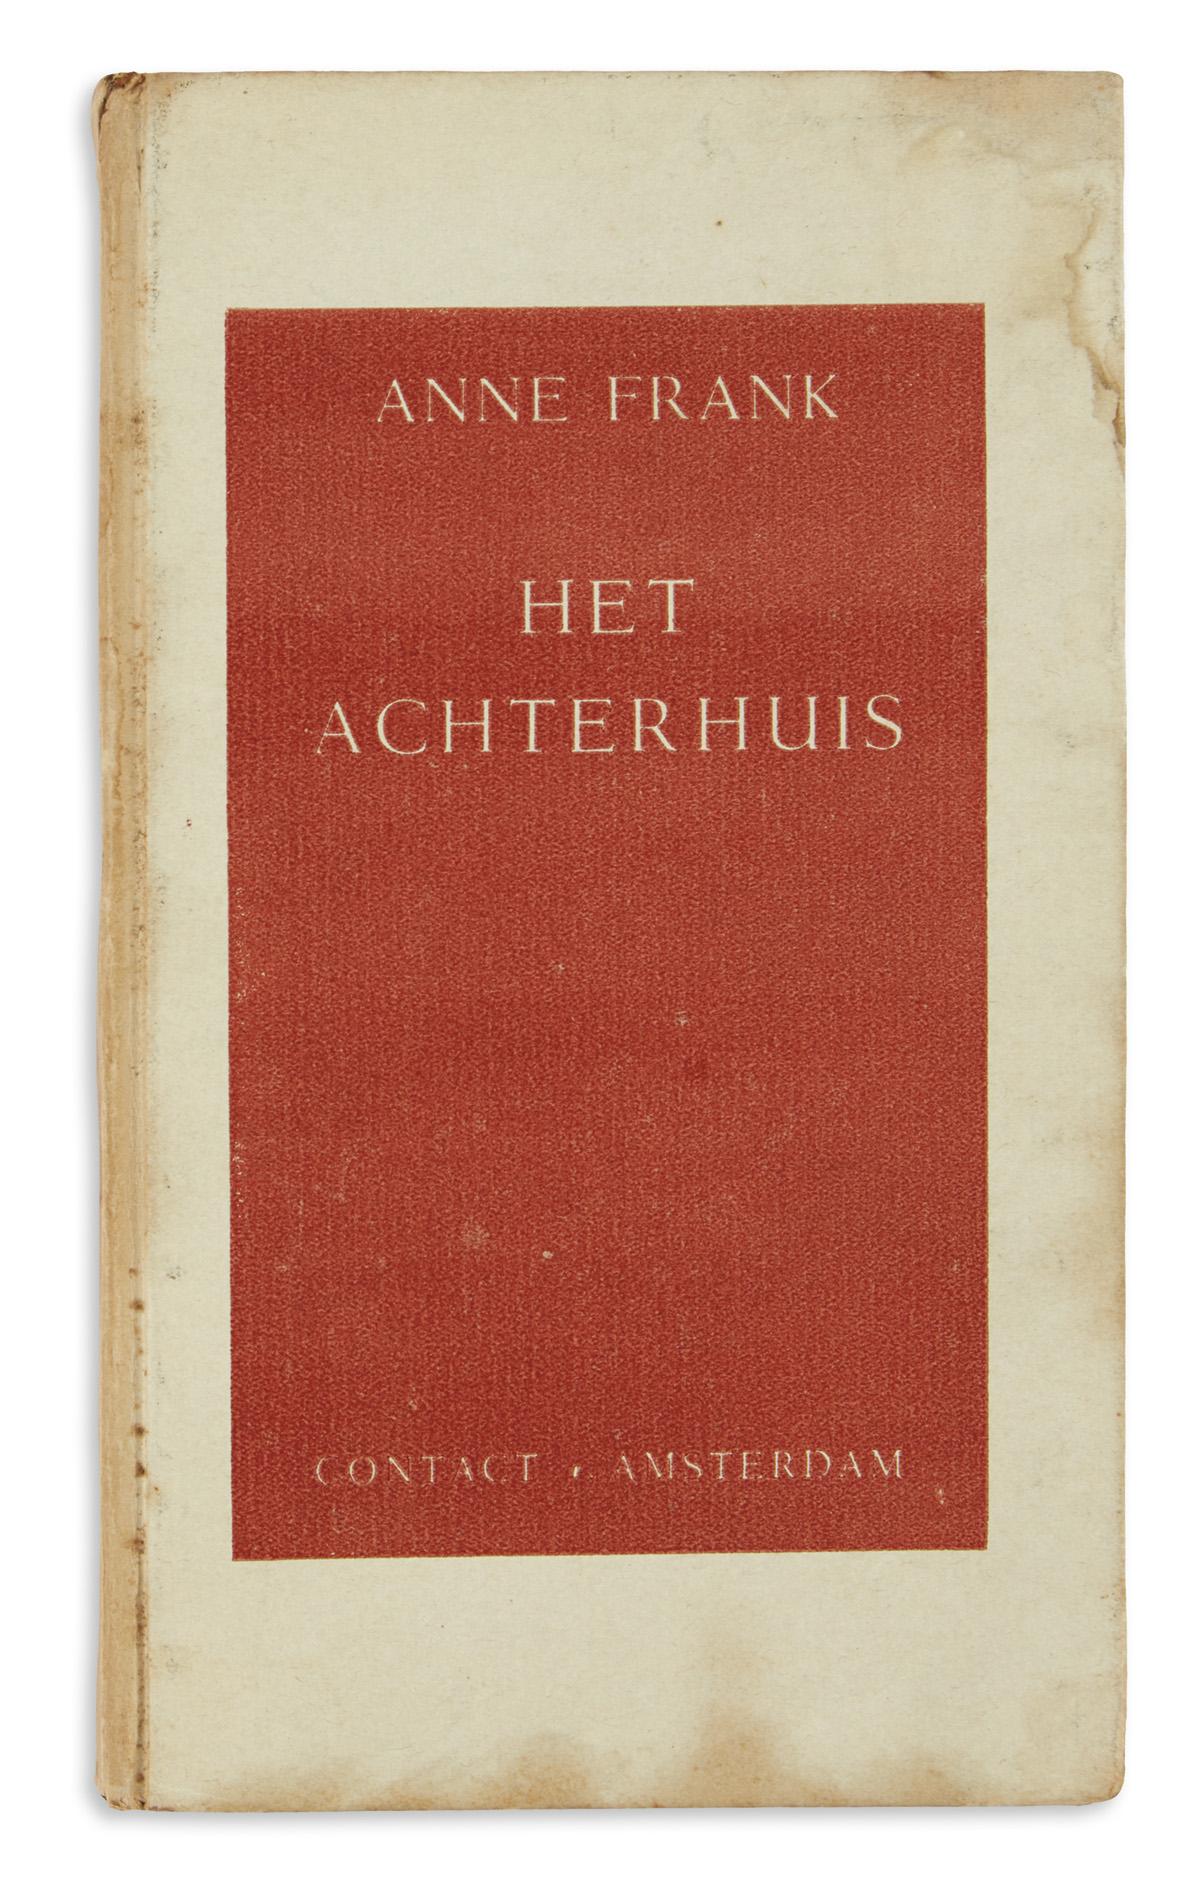 FRANK, ANNE. Het Achterhuis: Dagboekbrieven van 12 Juni 1942-1 Augustus 1944 [The House Behind: Diary Entries.]